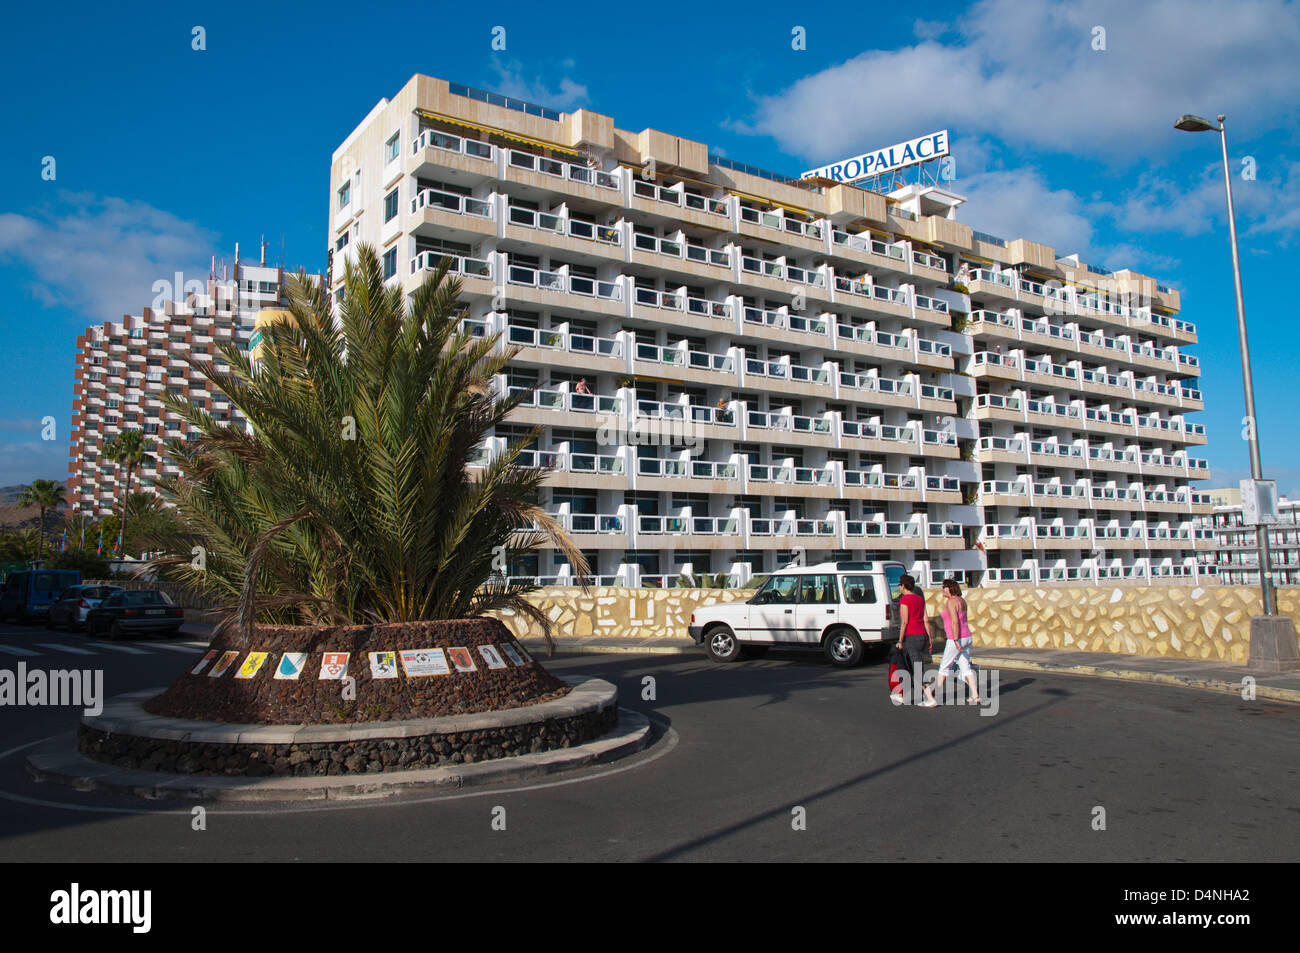 Europalace Hotel Playa del Ingles resort Gran Canaria Insel der Kanarischen Inseln-Spanien-Europa Stockbild